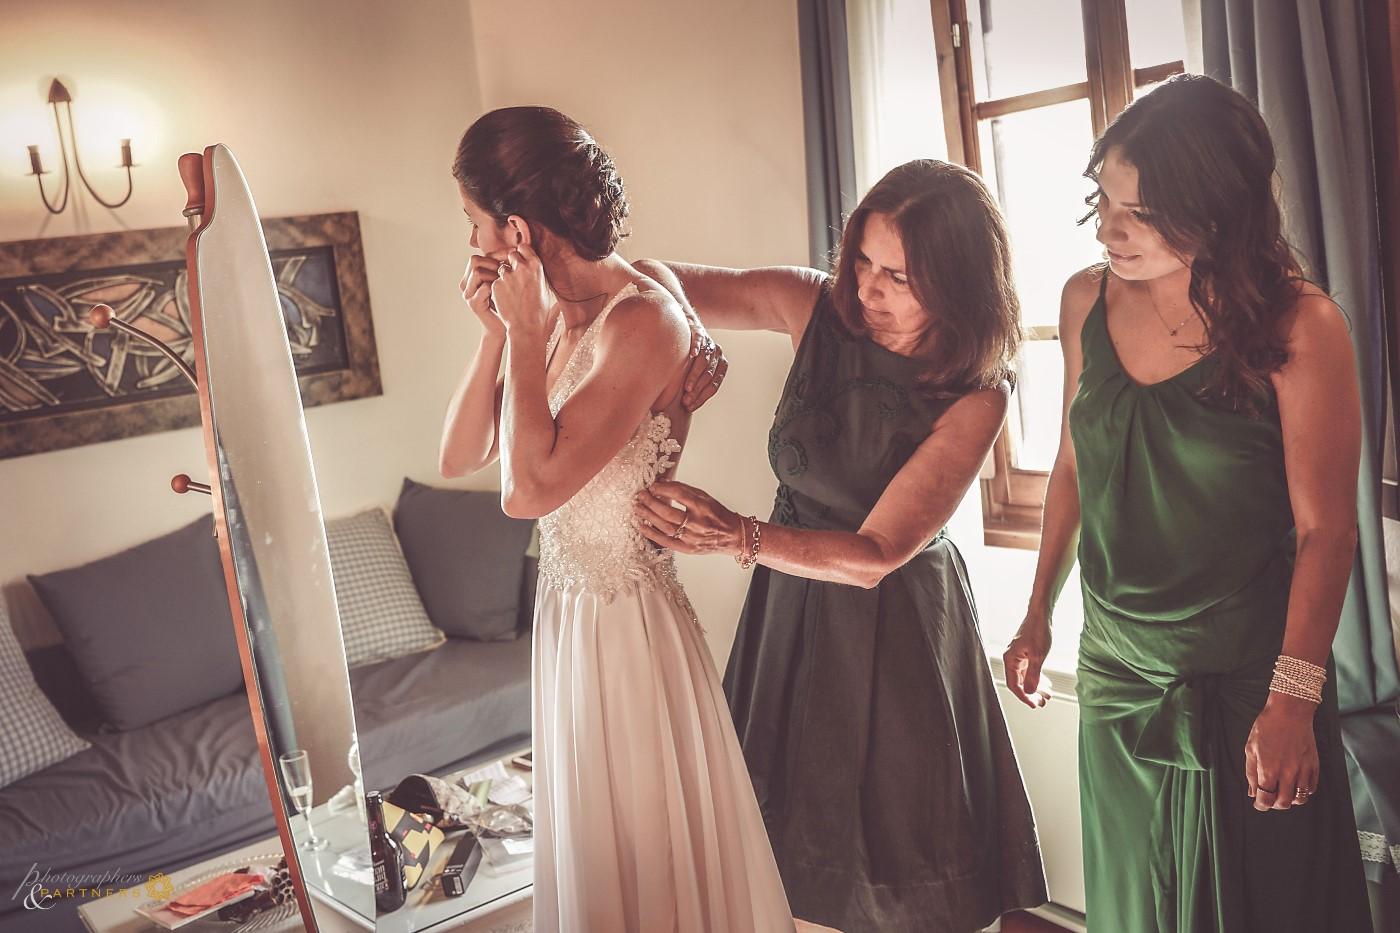 photographer_weddings_montepulciano_03.jpg